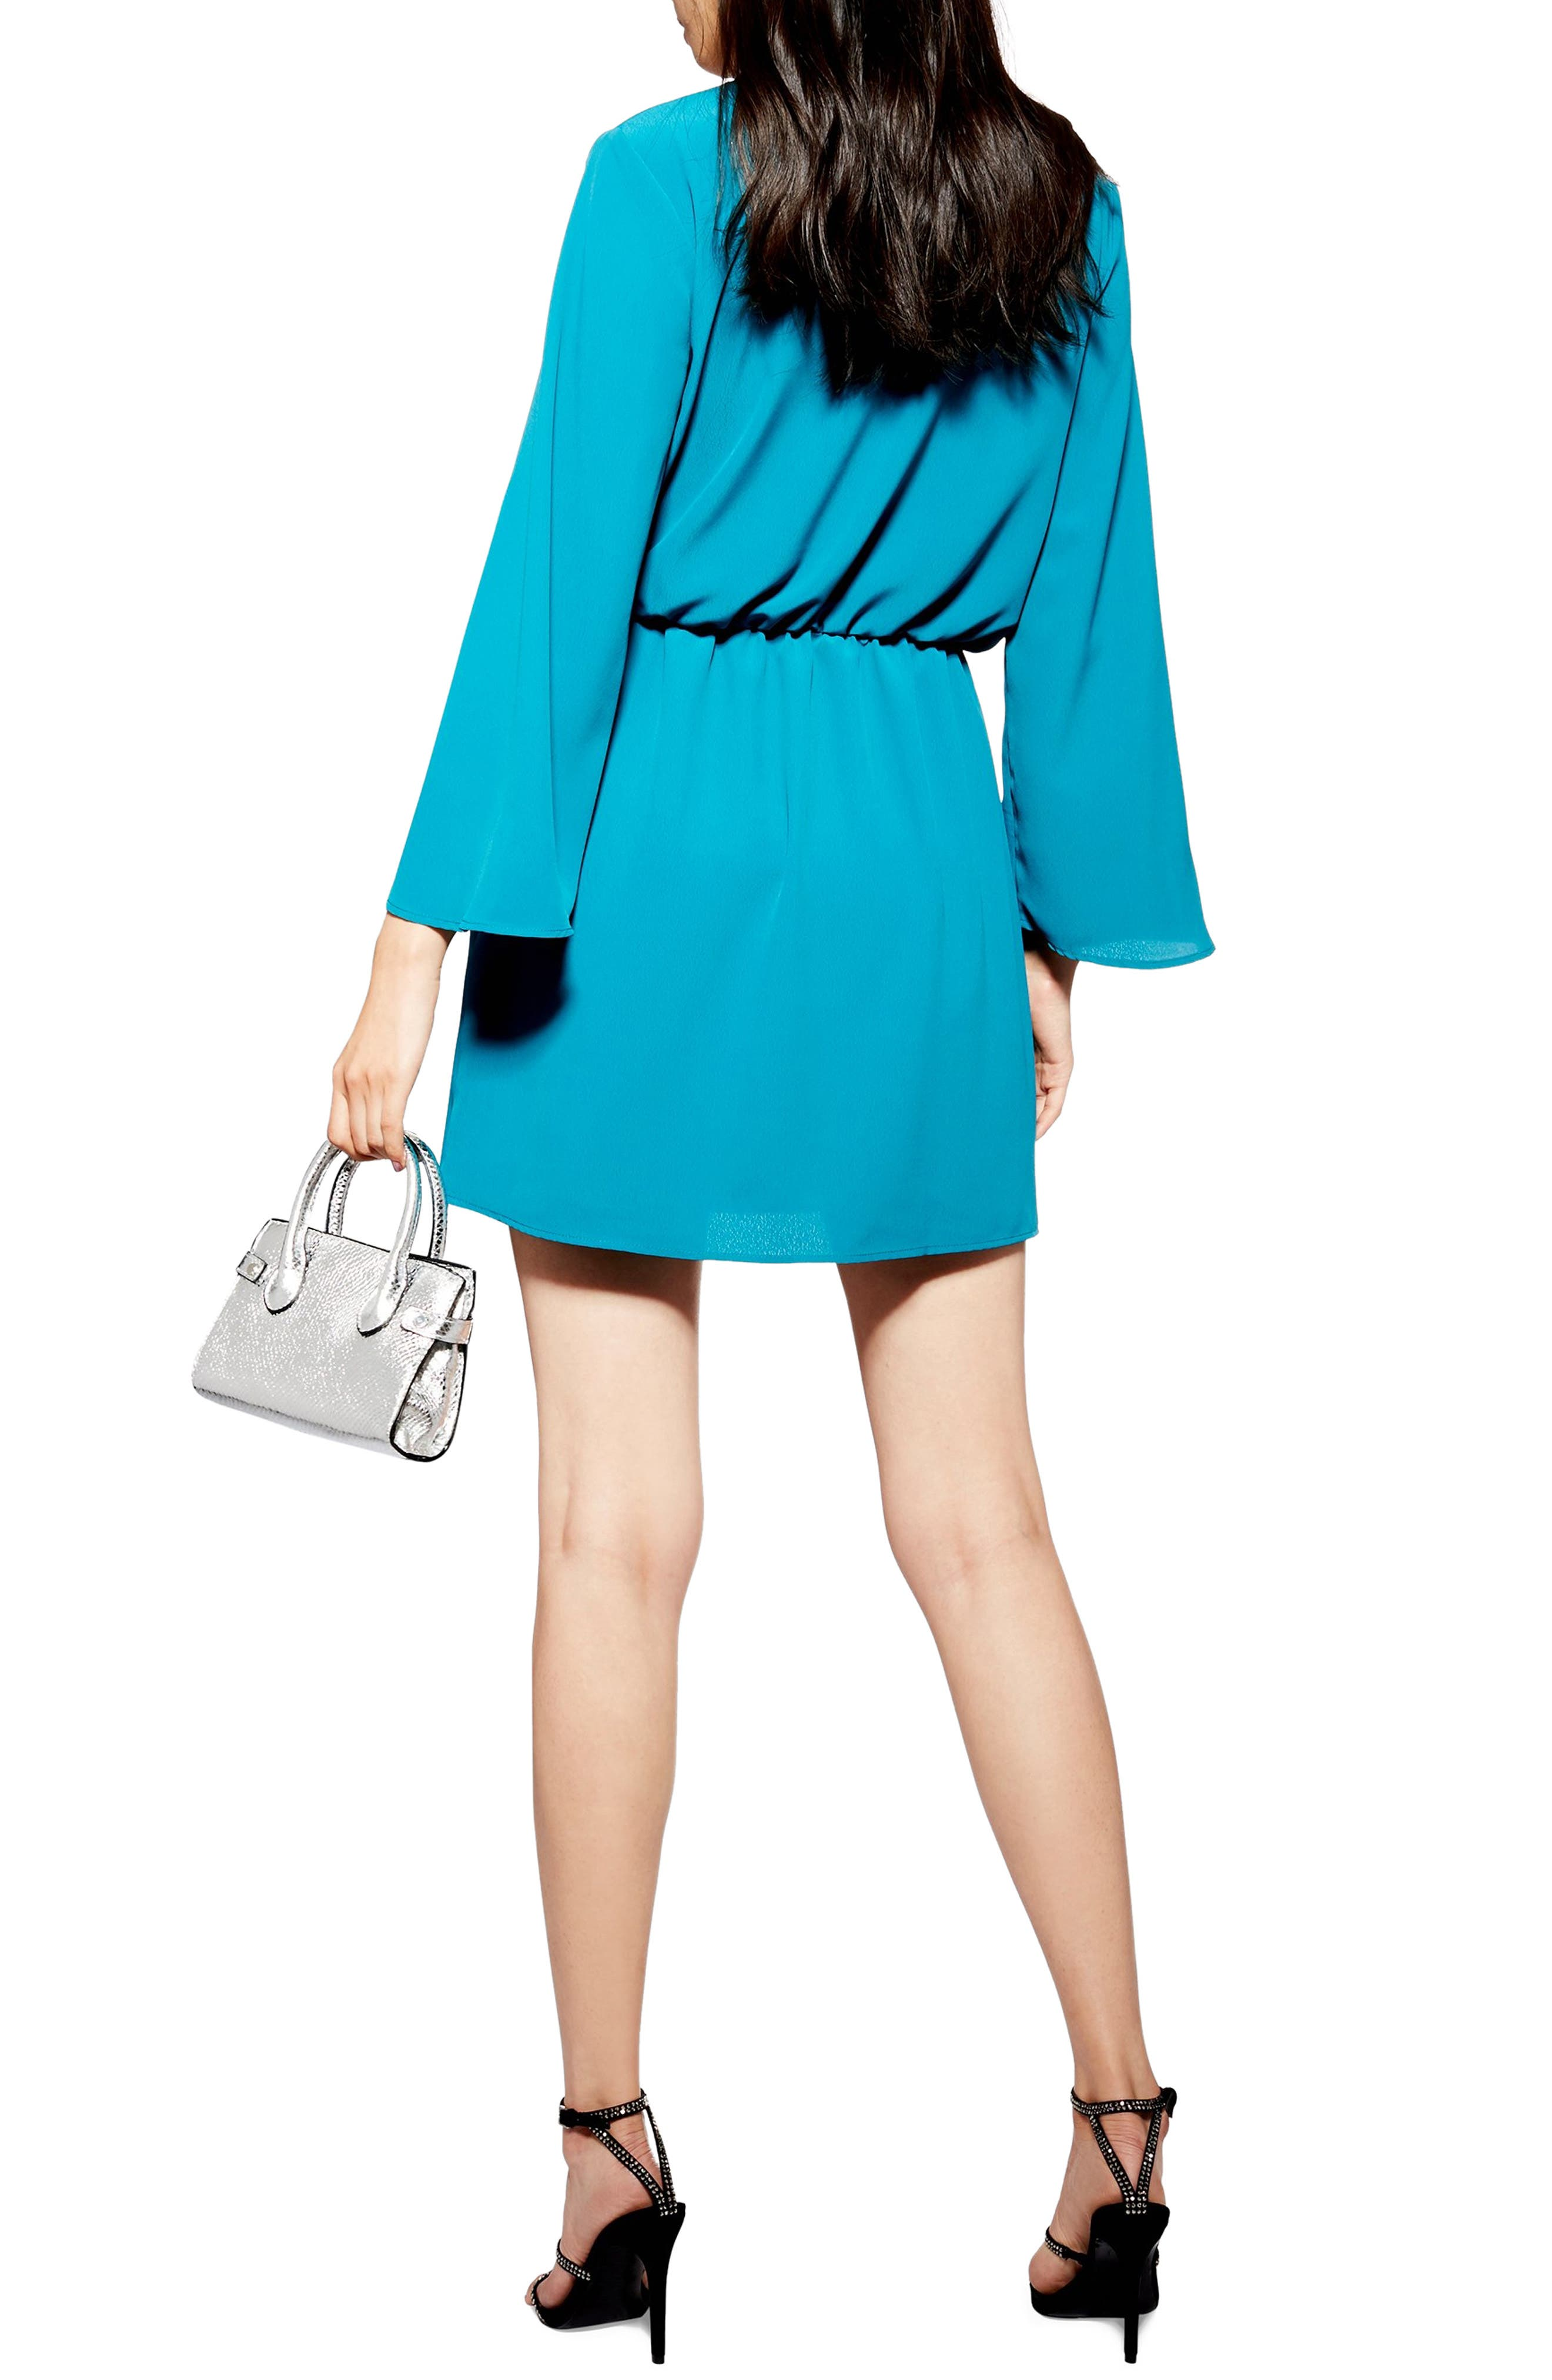 TOPSHOP, Tiffany Knot Minidress, Alternate thumbnail 2, color, TEAL